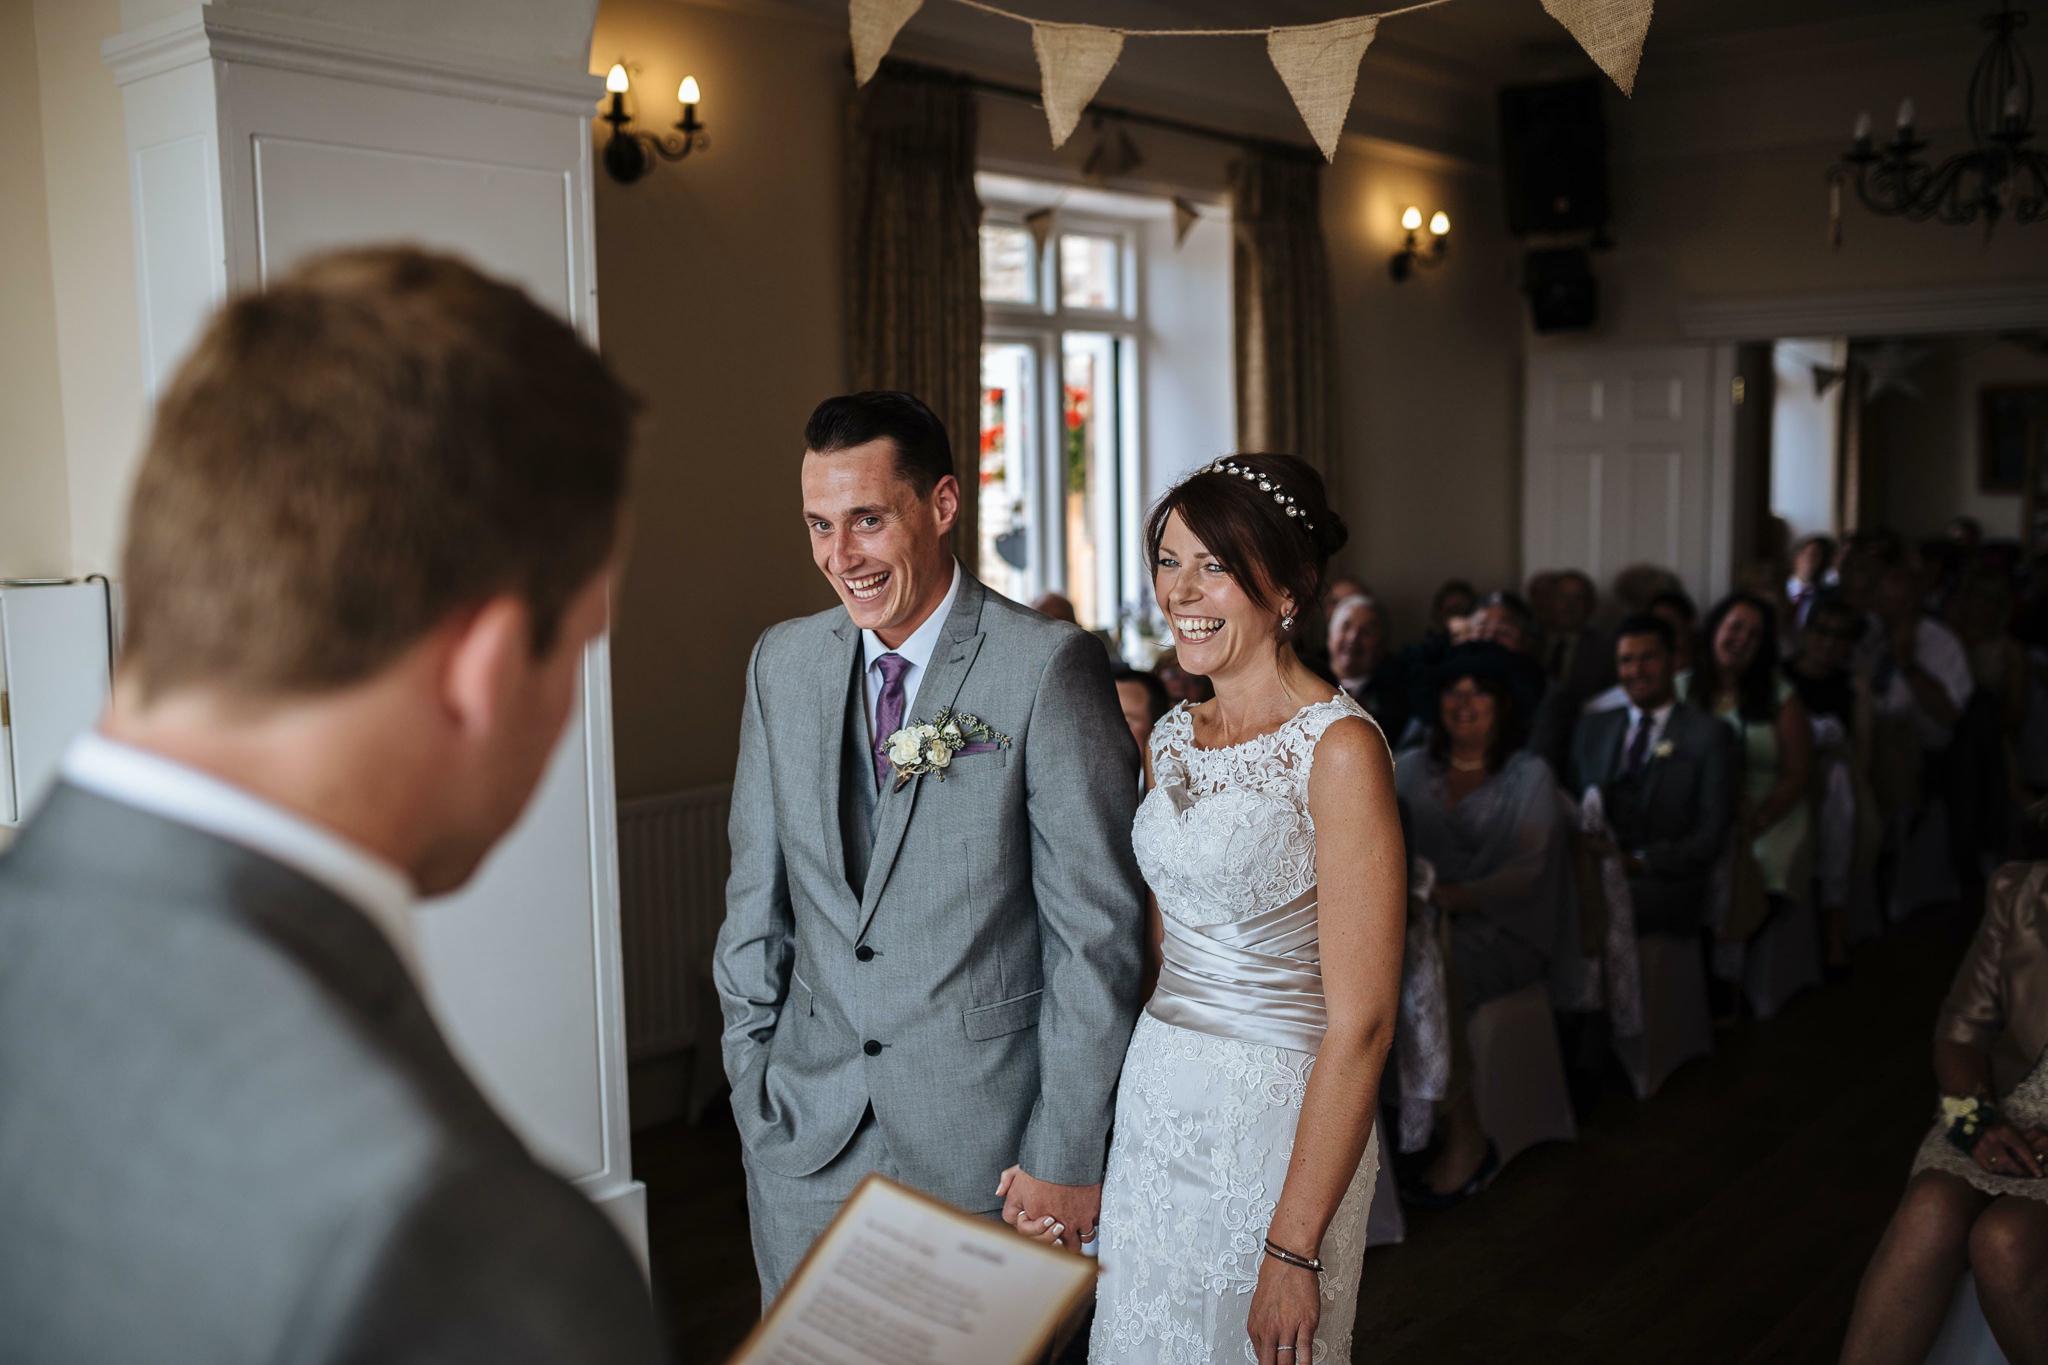 paul-marbrook-Caer-Llan-Wedding-Photographer-90044